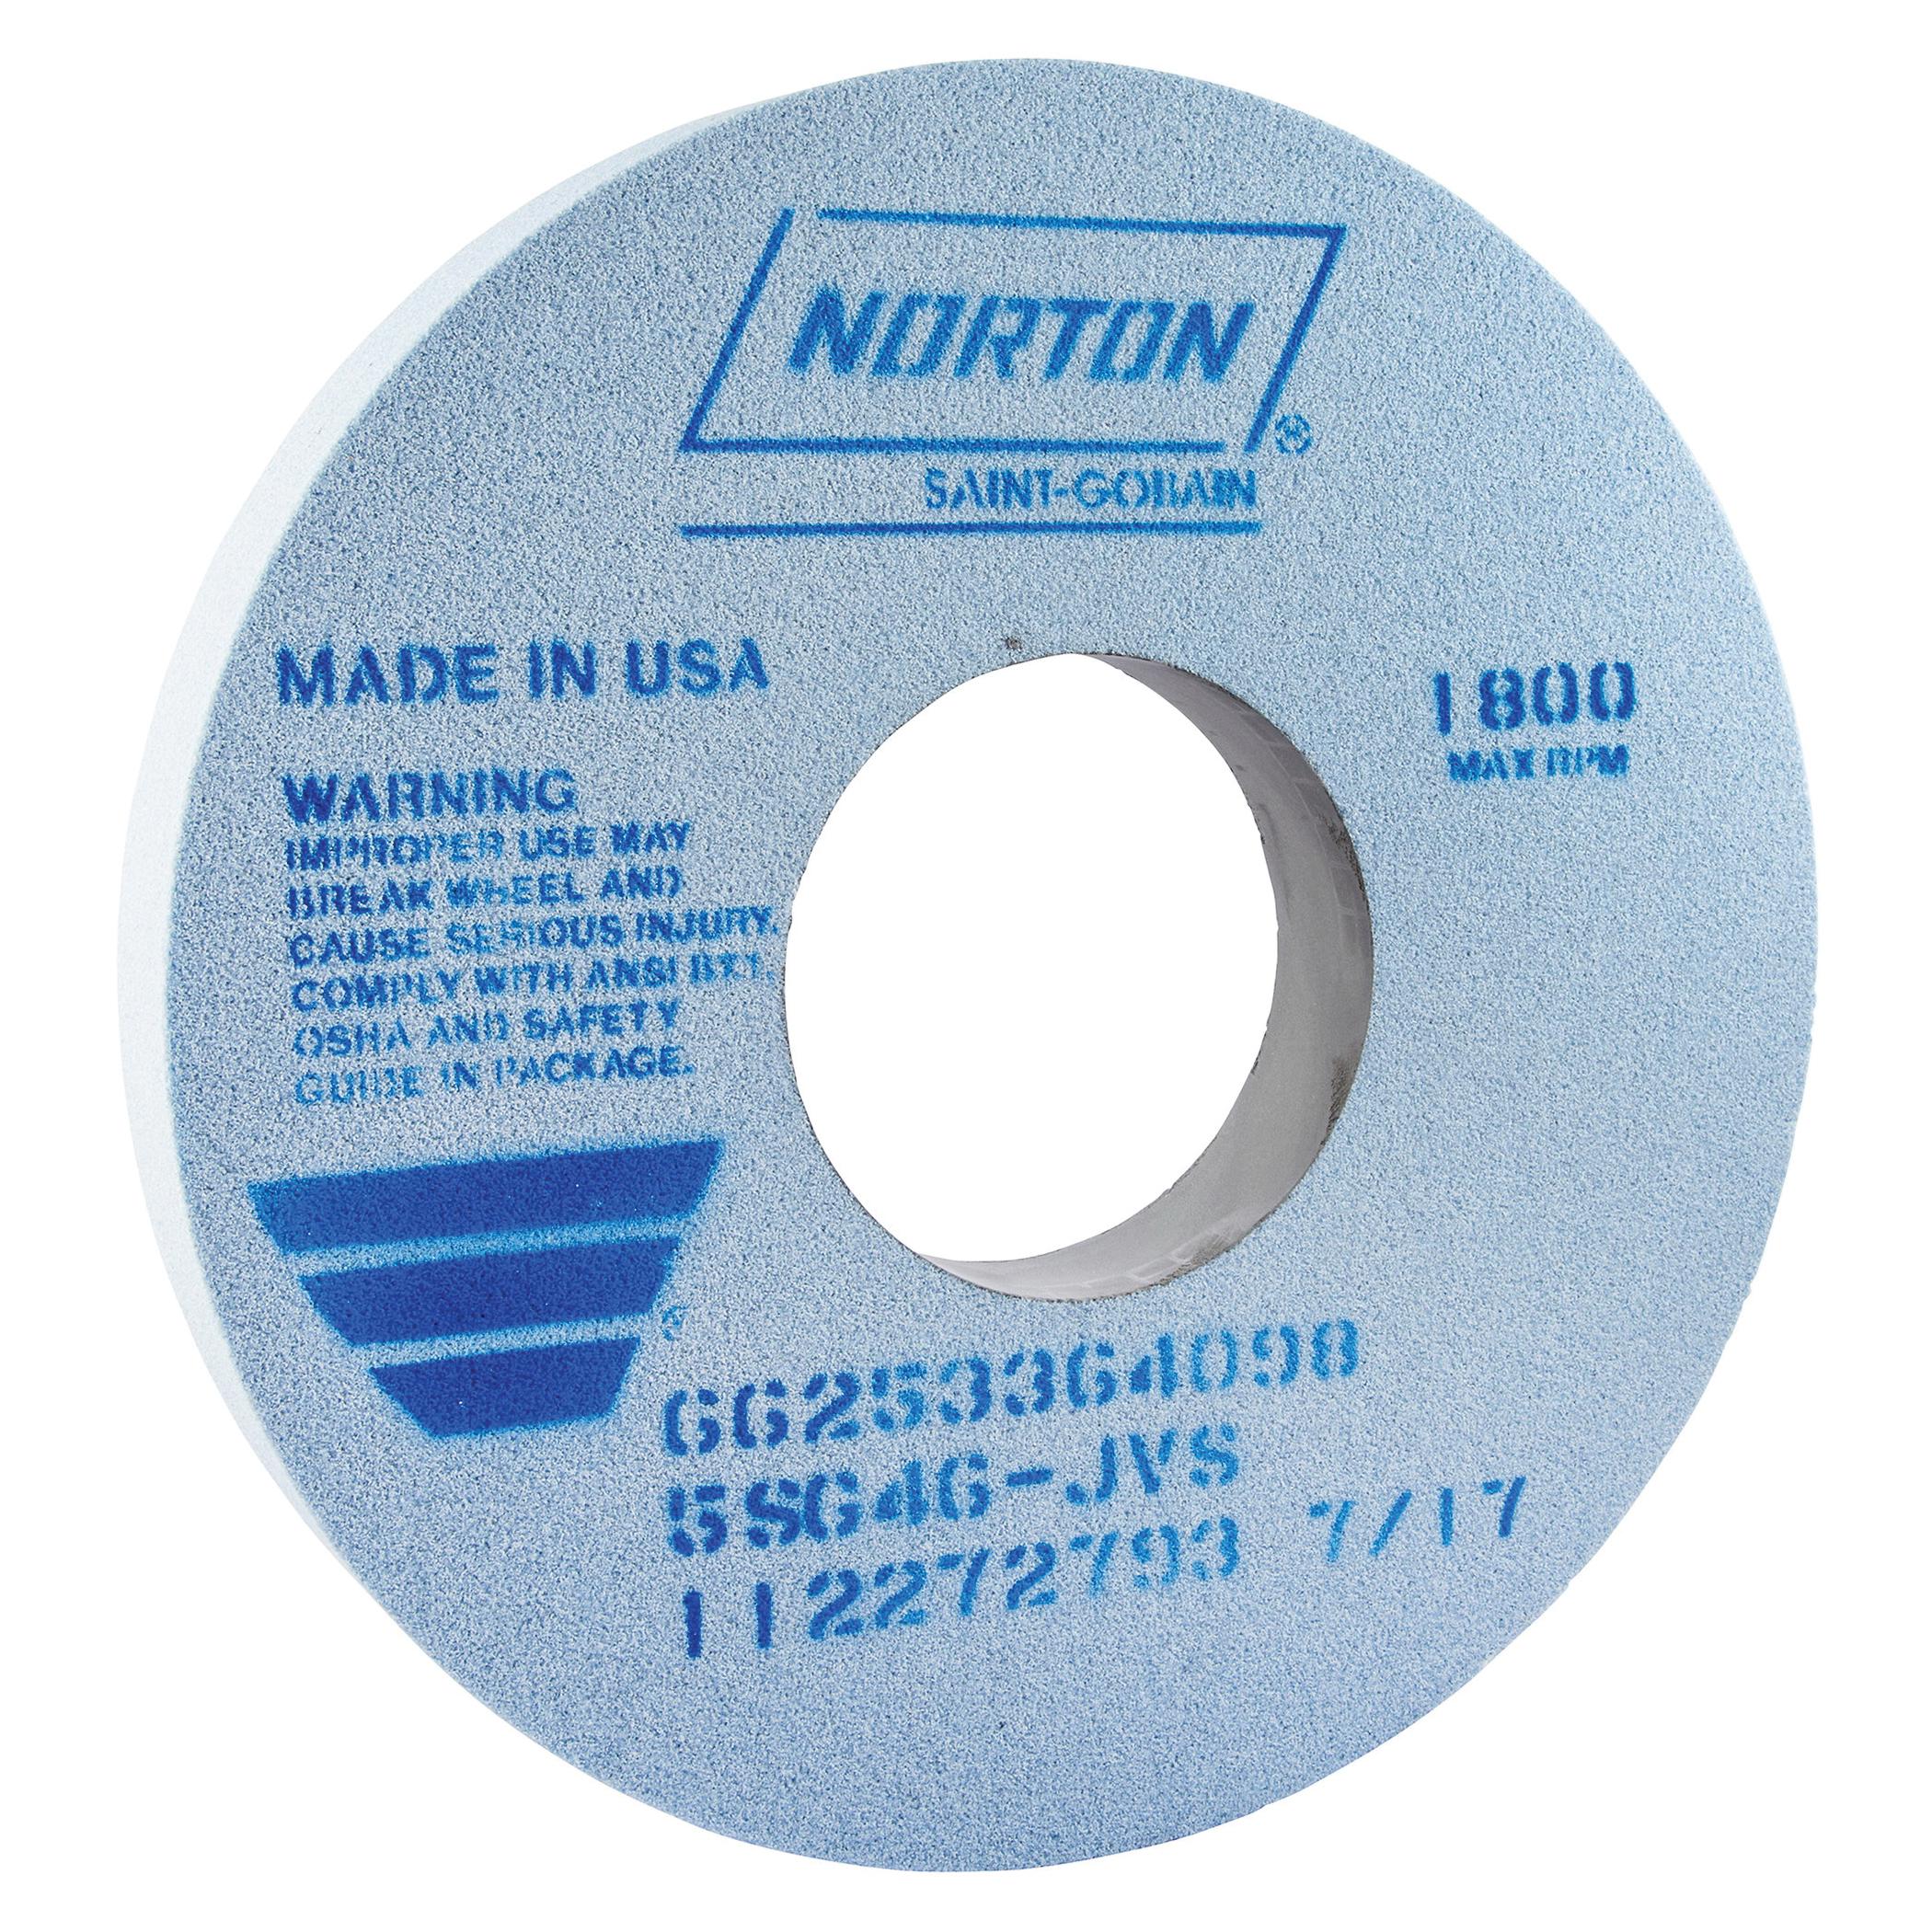 Norton® 66253364100 5SG Straight Toolroom Wheel, 14 in Dia x 1-1/2 in THK, 5 in Center Hole, 60 Grit, Ceramic Alumina/Friable Aluminum Oxide Abrasive